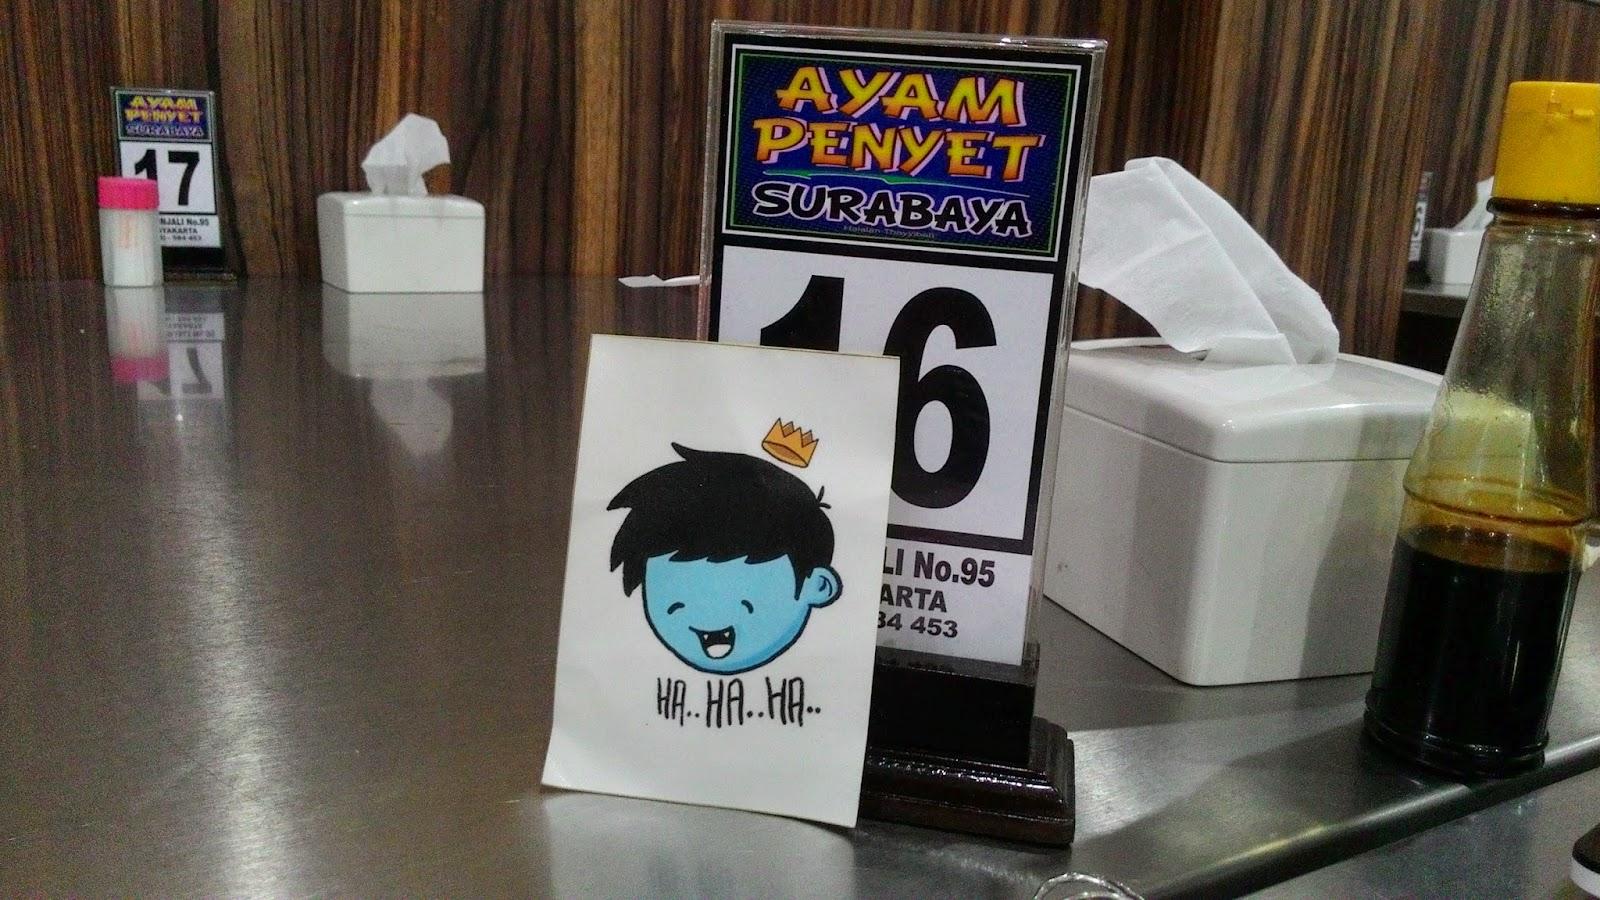 Crezno sticker at Ayam penyet surabaya, YK | anggitabay